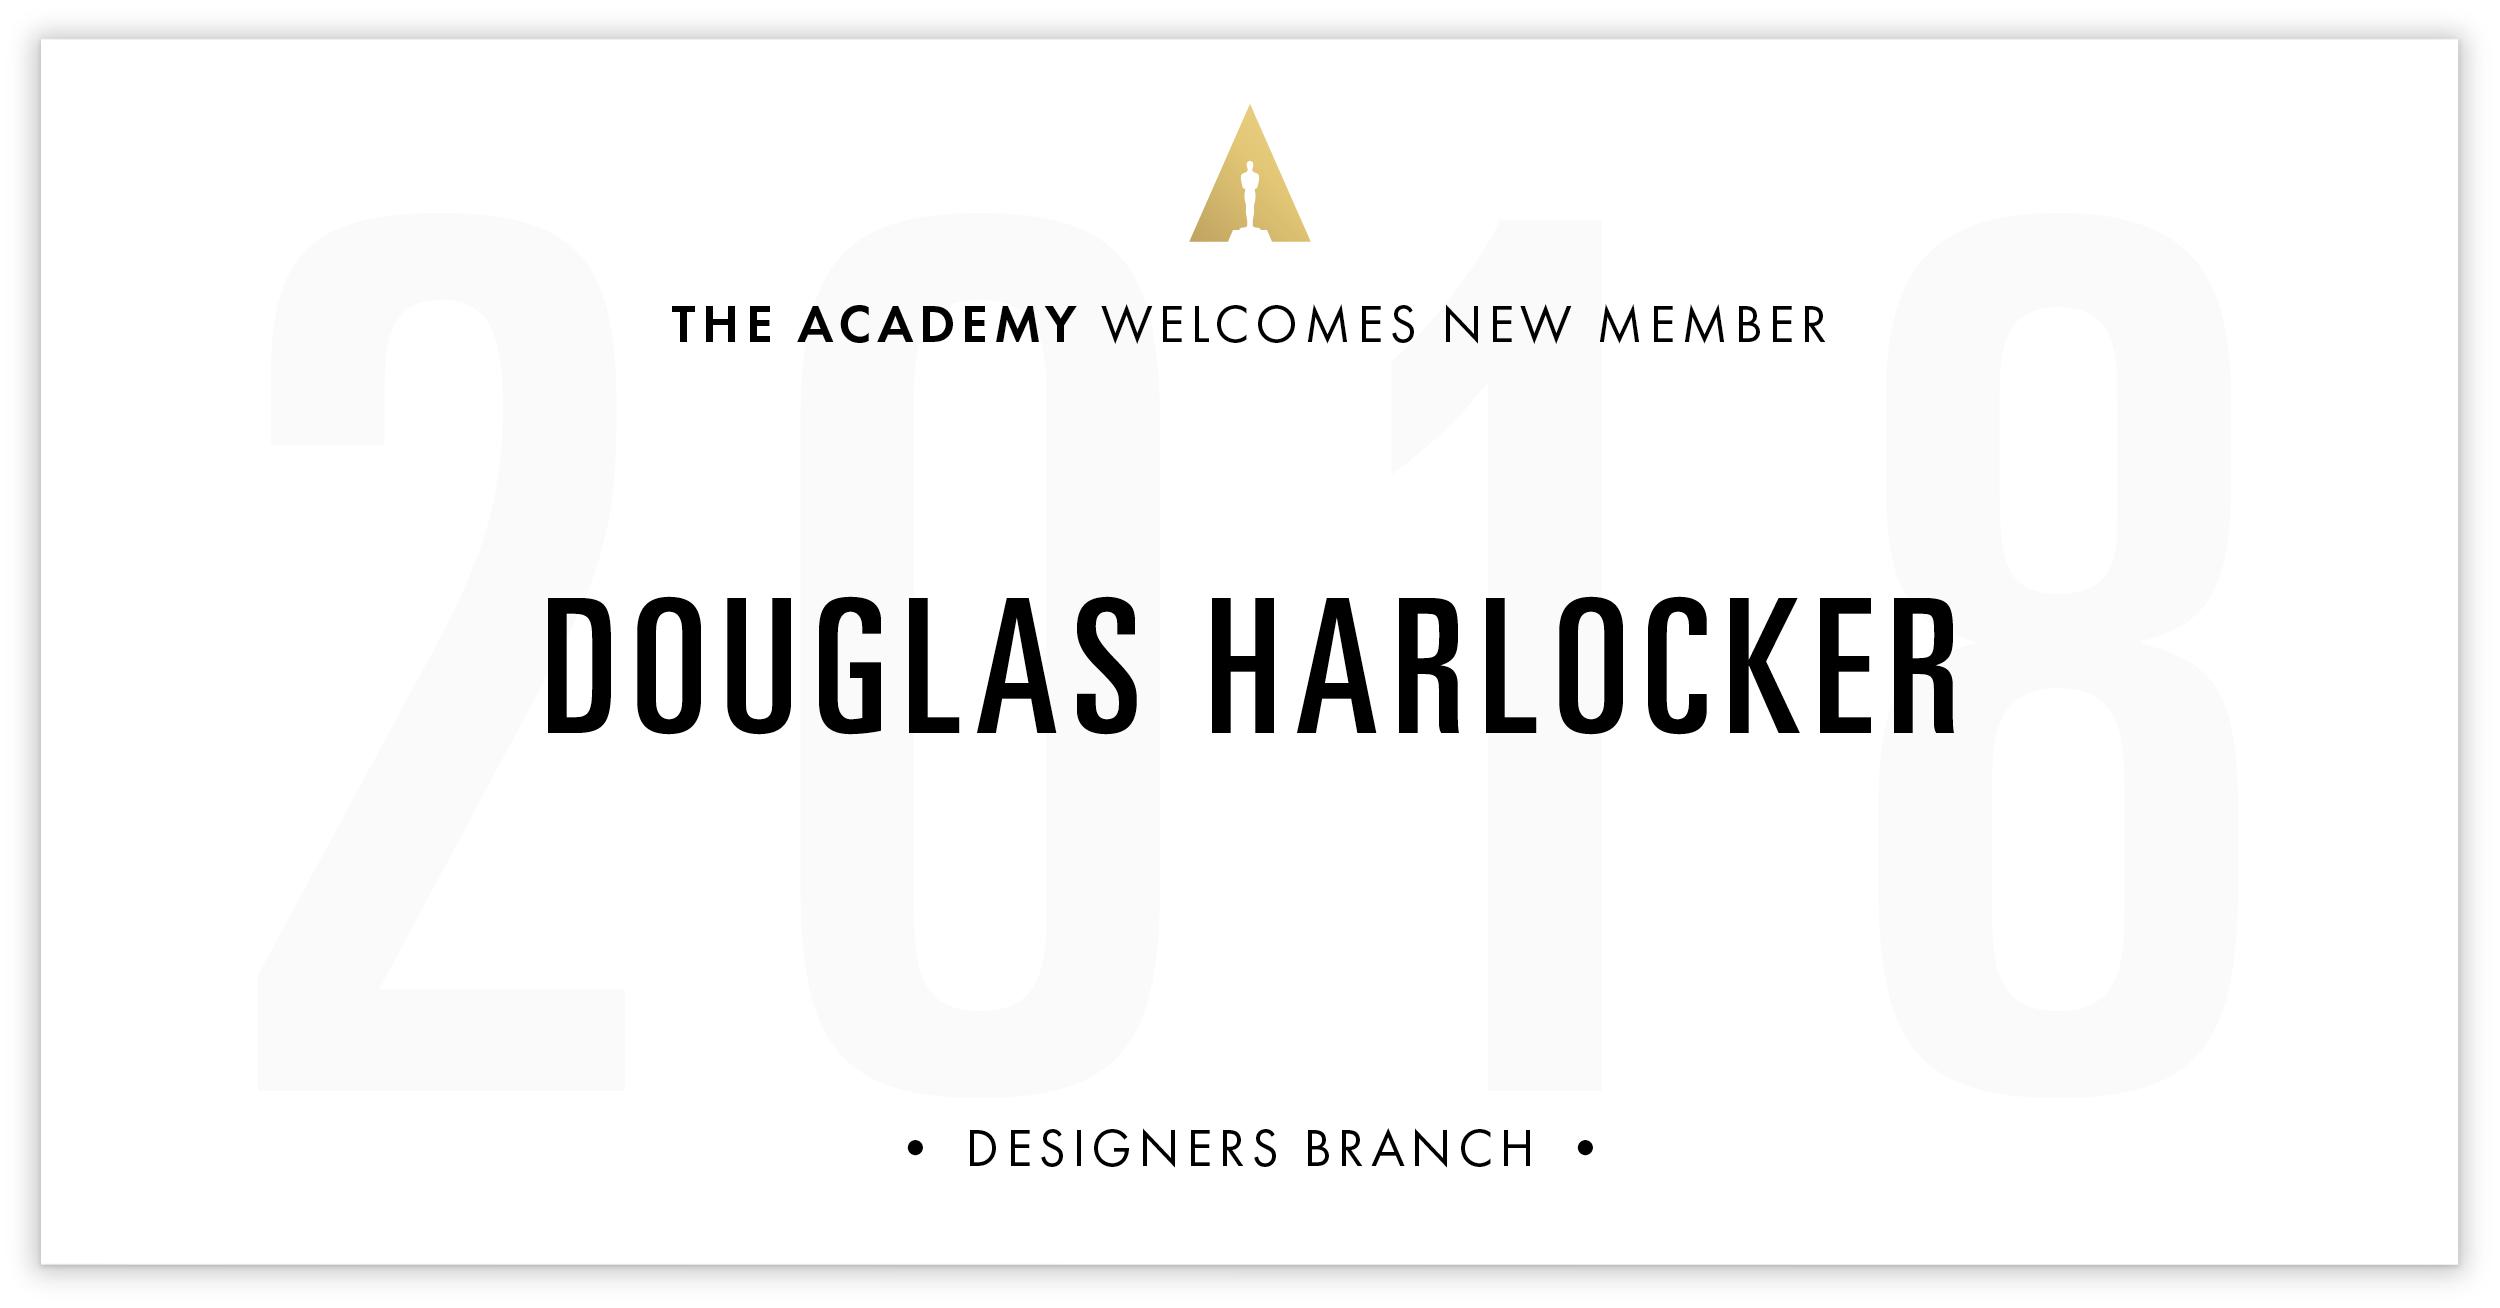 Douglas Harlocker is invited!